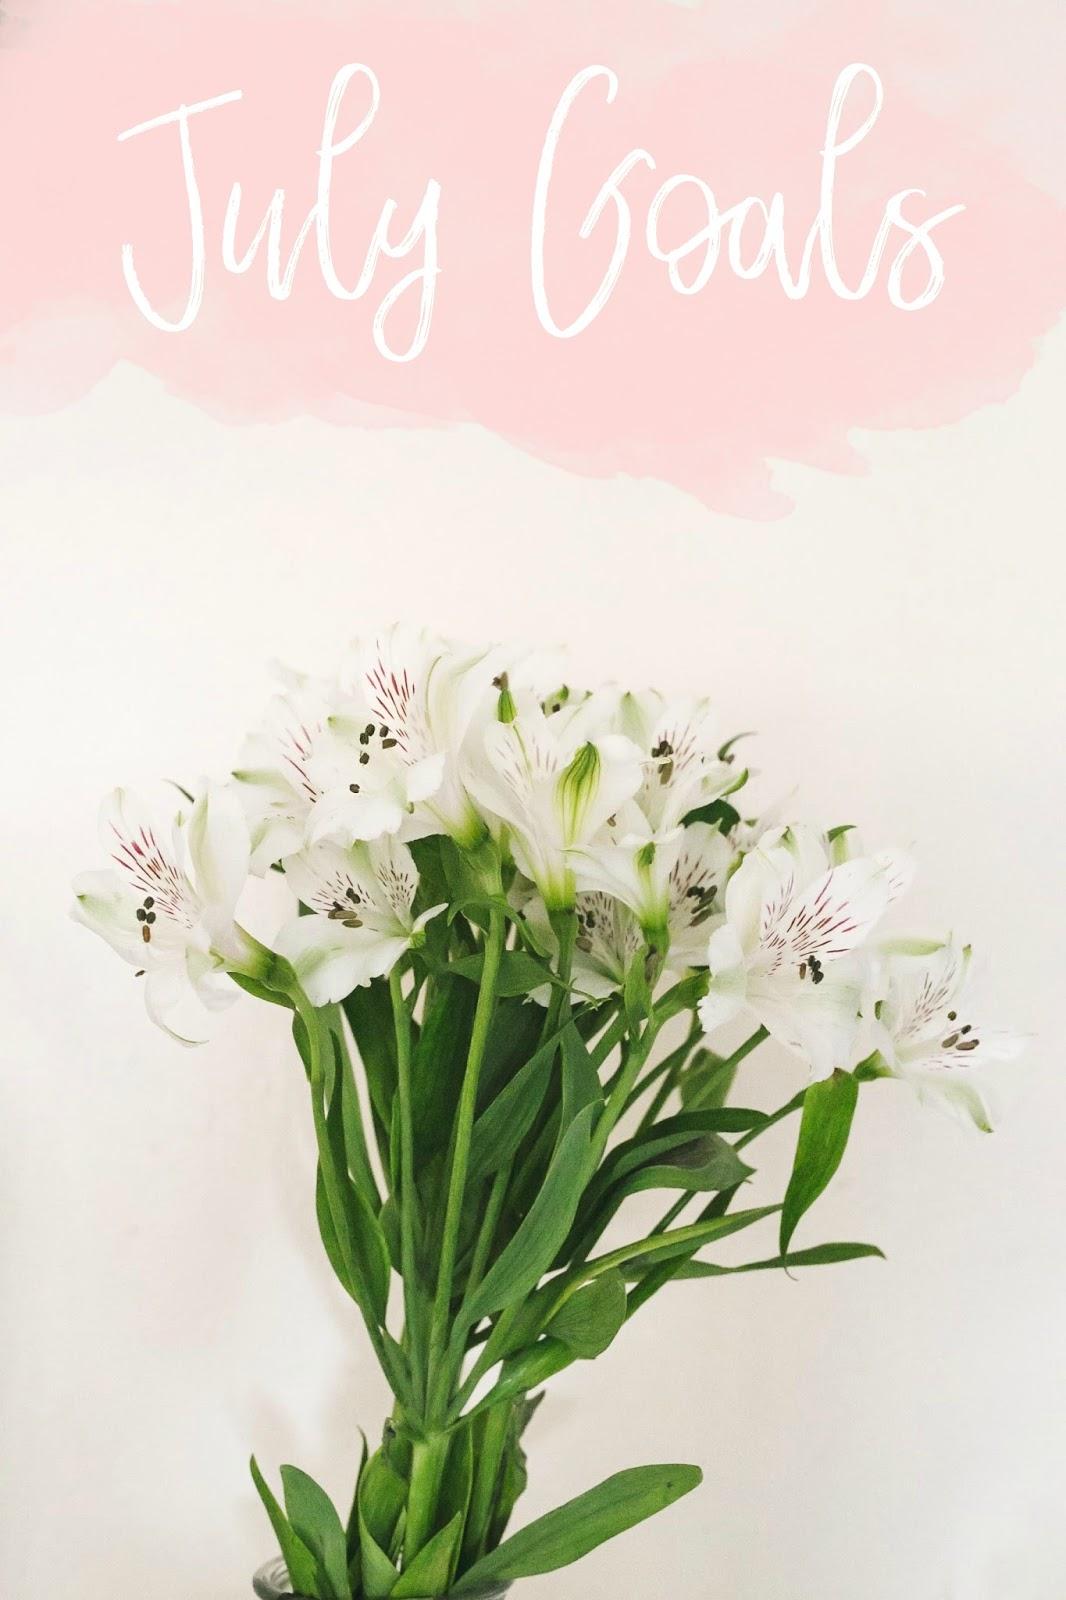 Flowers, Bloom, July Goals, Derbyshire Blogs, Derbyshire Bloggers, East Midlands Bloggers, East Mids, Katie Brown, Blogger, Katie Writes Blog, Katie Writes,